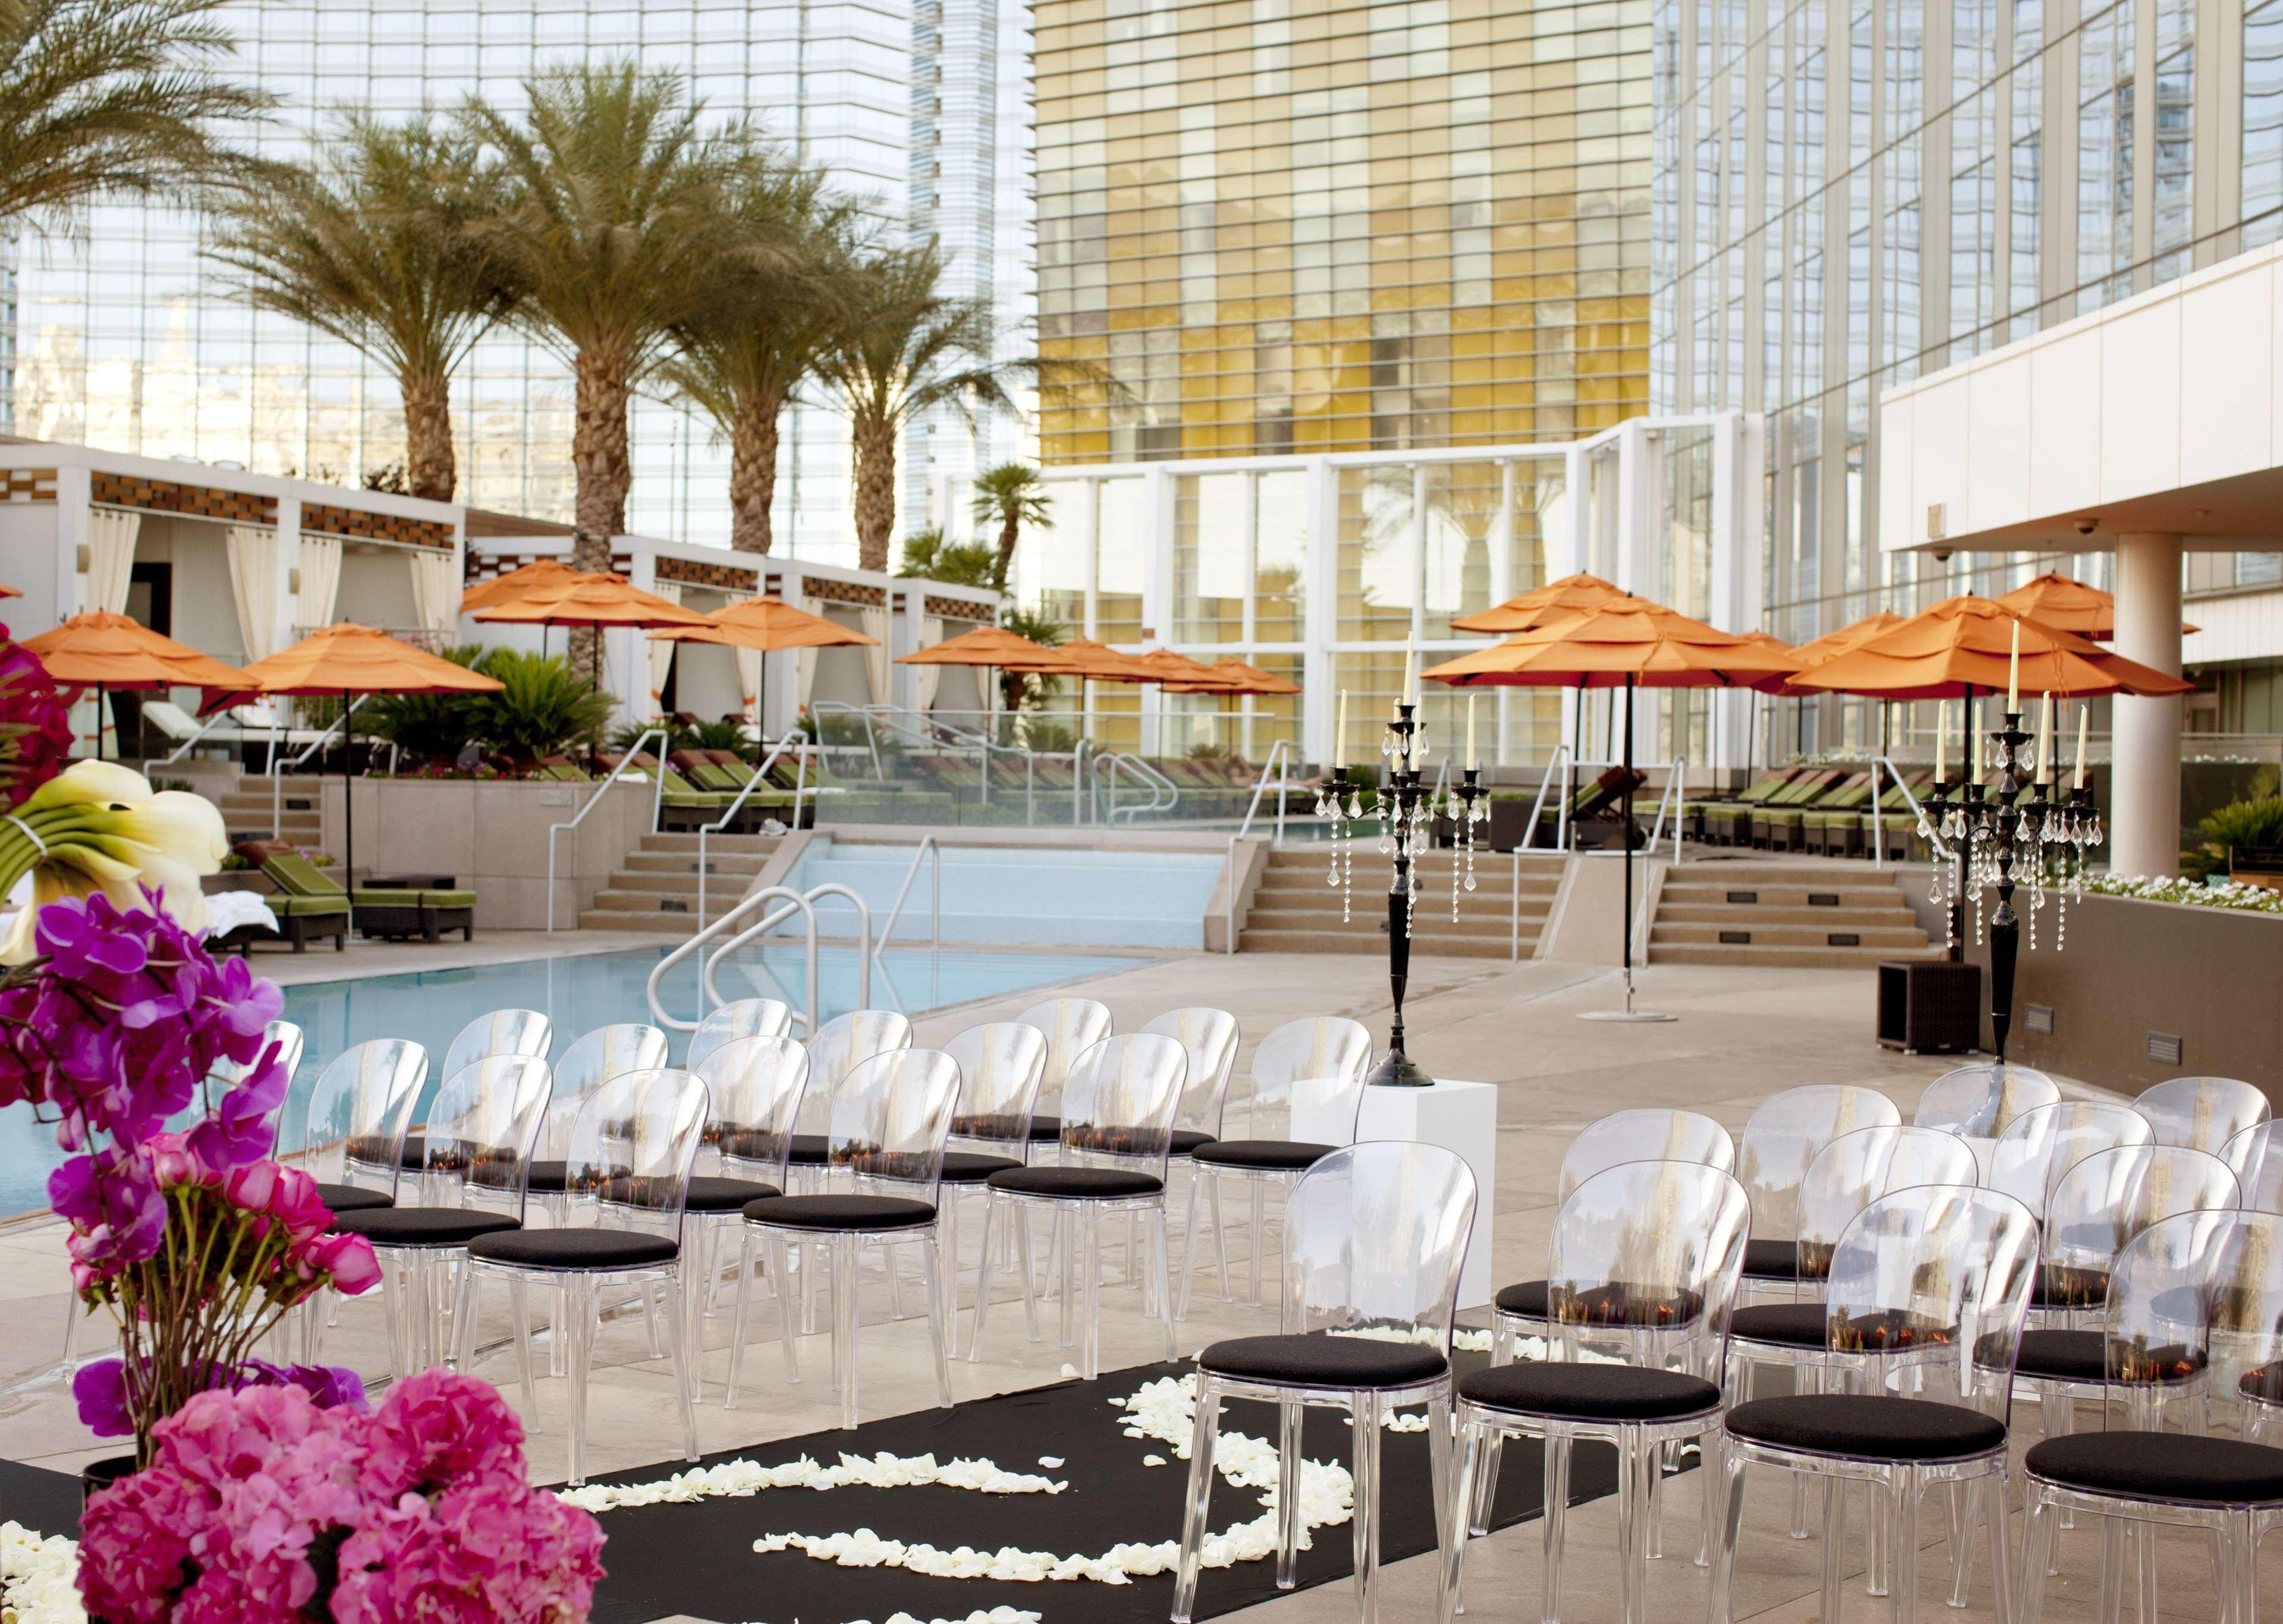 Waldorf Astoria Las Vegas image 11